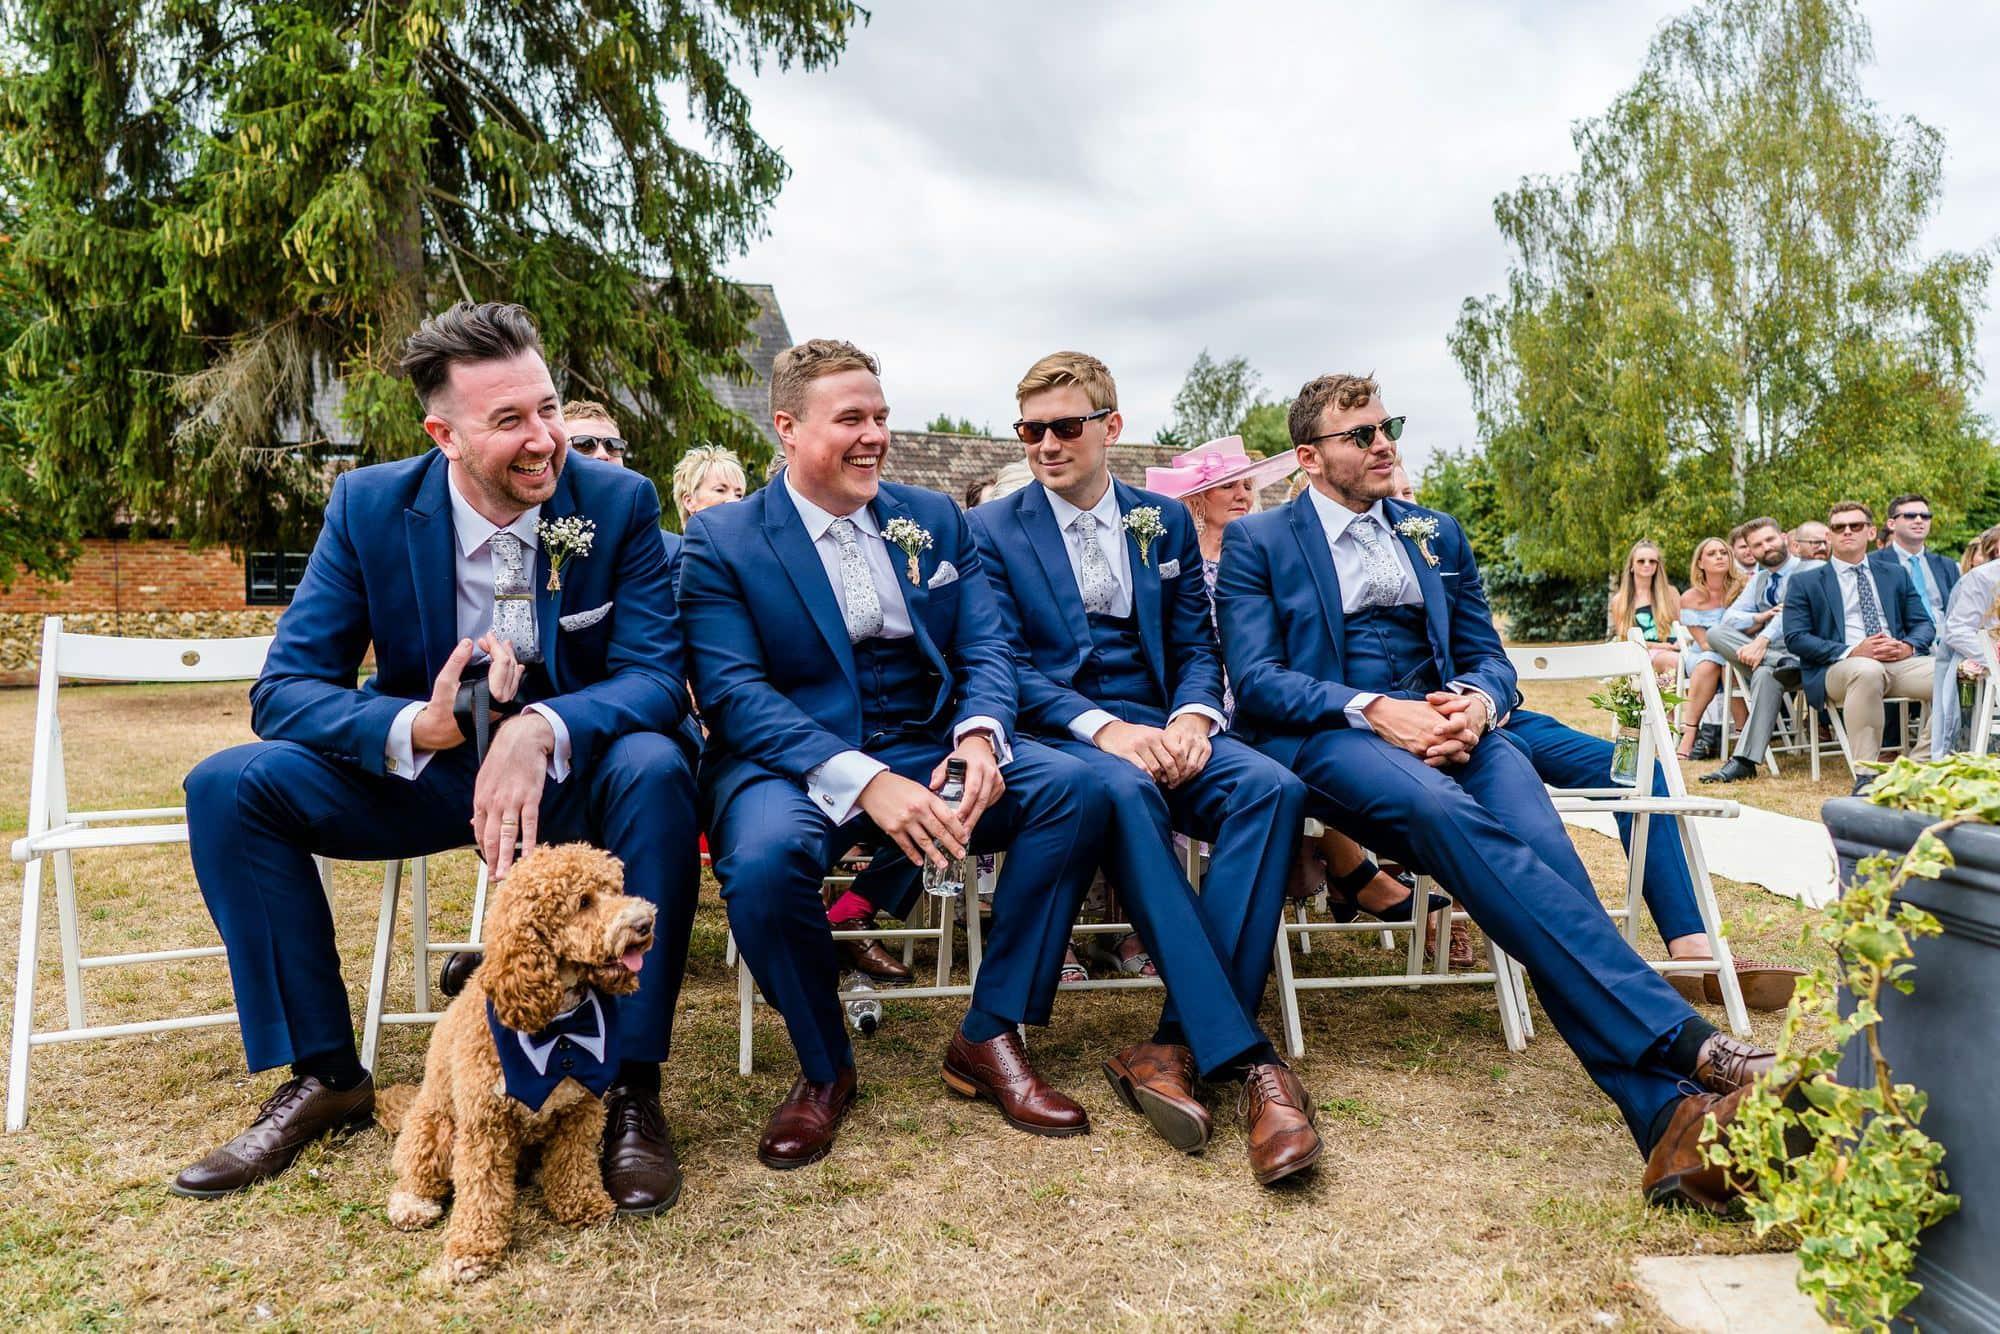 Mark-Seymour-Wedding-Photographer-UK-19 8